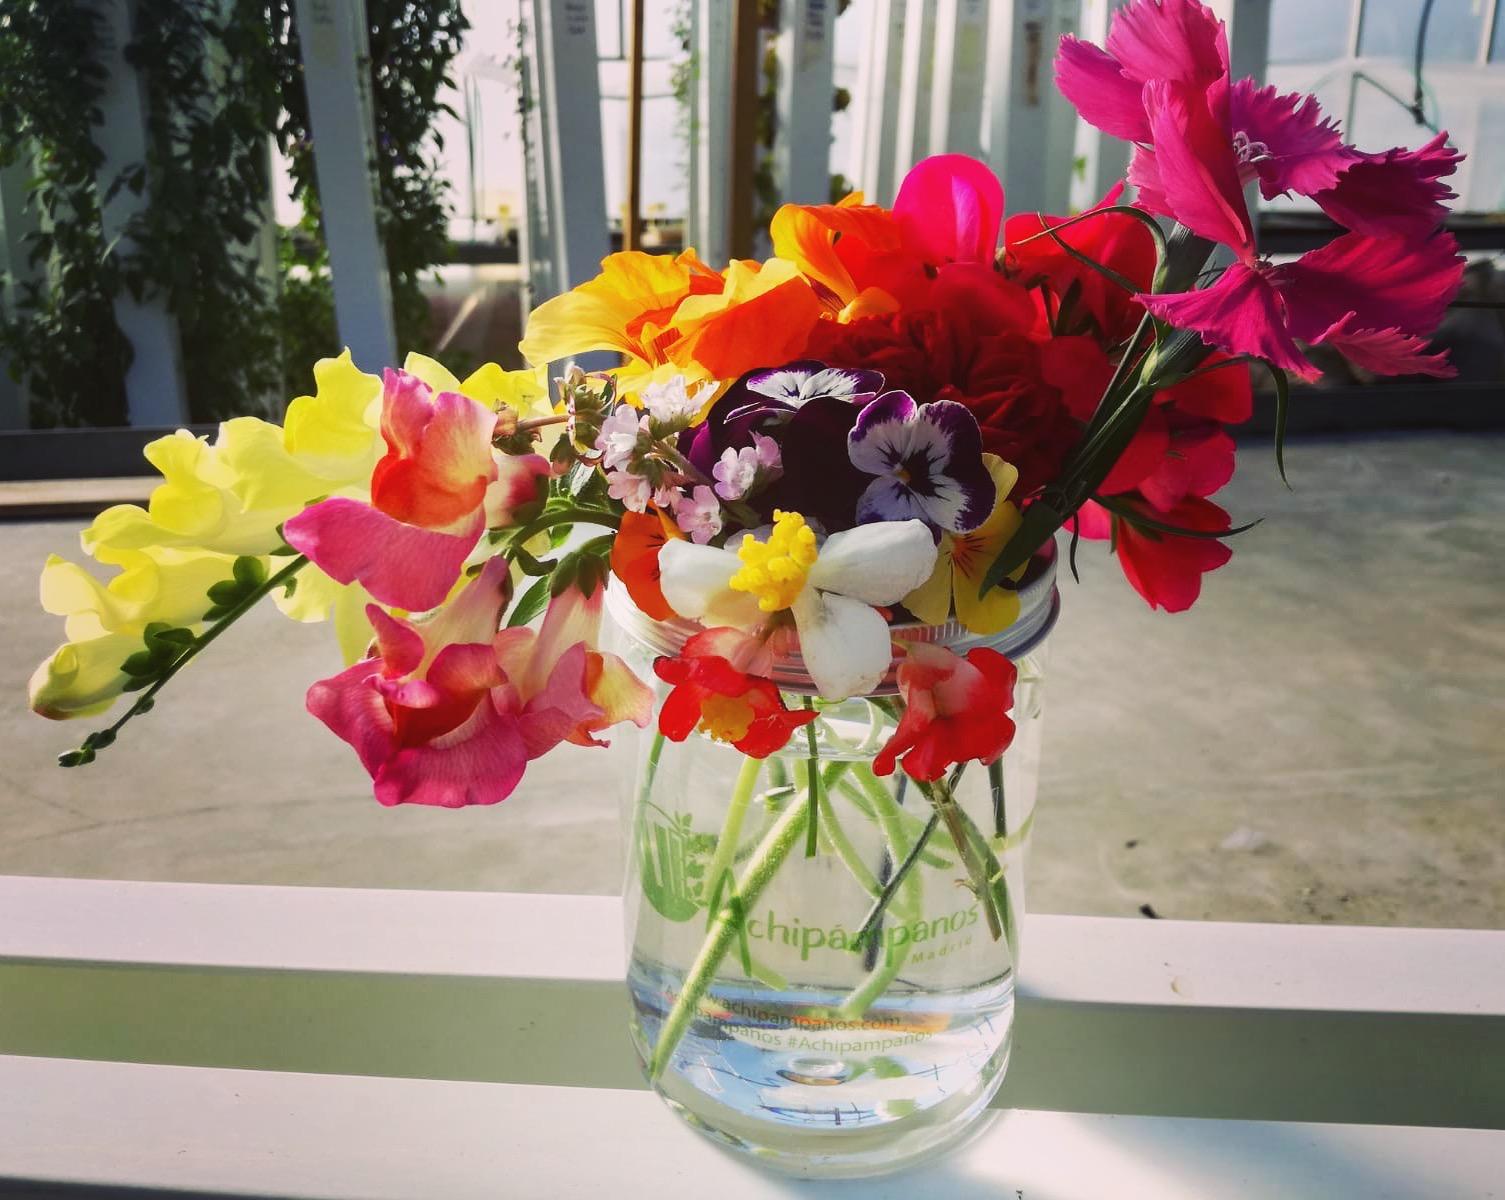 Tarro flores.jpg